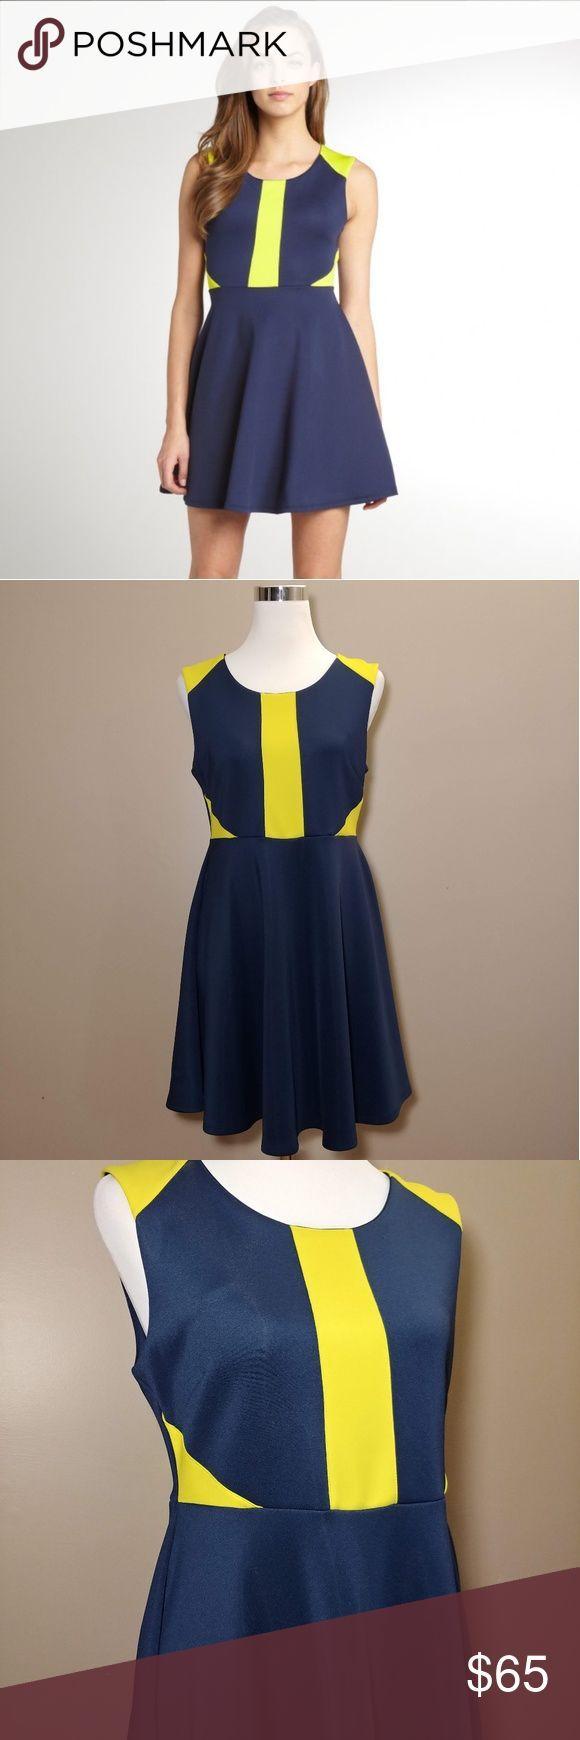 Nwt Romeo Juliet Blue Yellow Skater Dress Super Cute Blue And Yellow Dress By Romeo Juliet Coutu Blue Cout Blue And Yellow Dress Yellow Dress Fashion [ 1740 x 580 Pixel ]